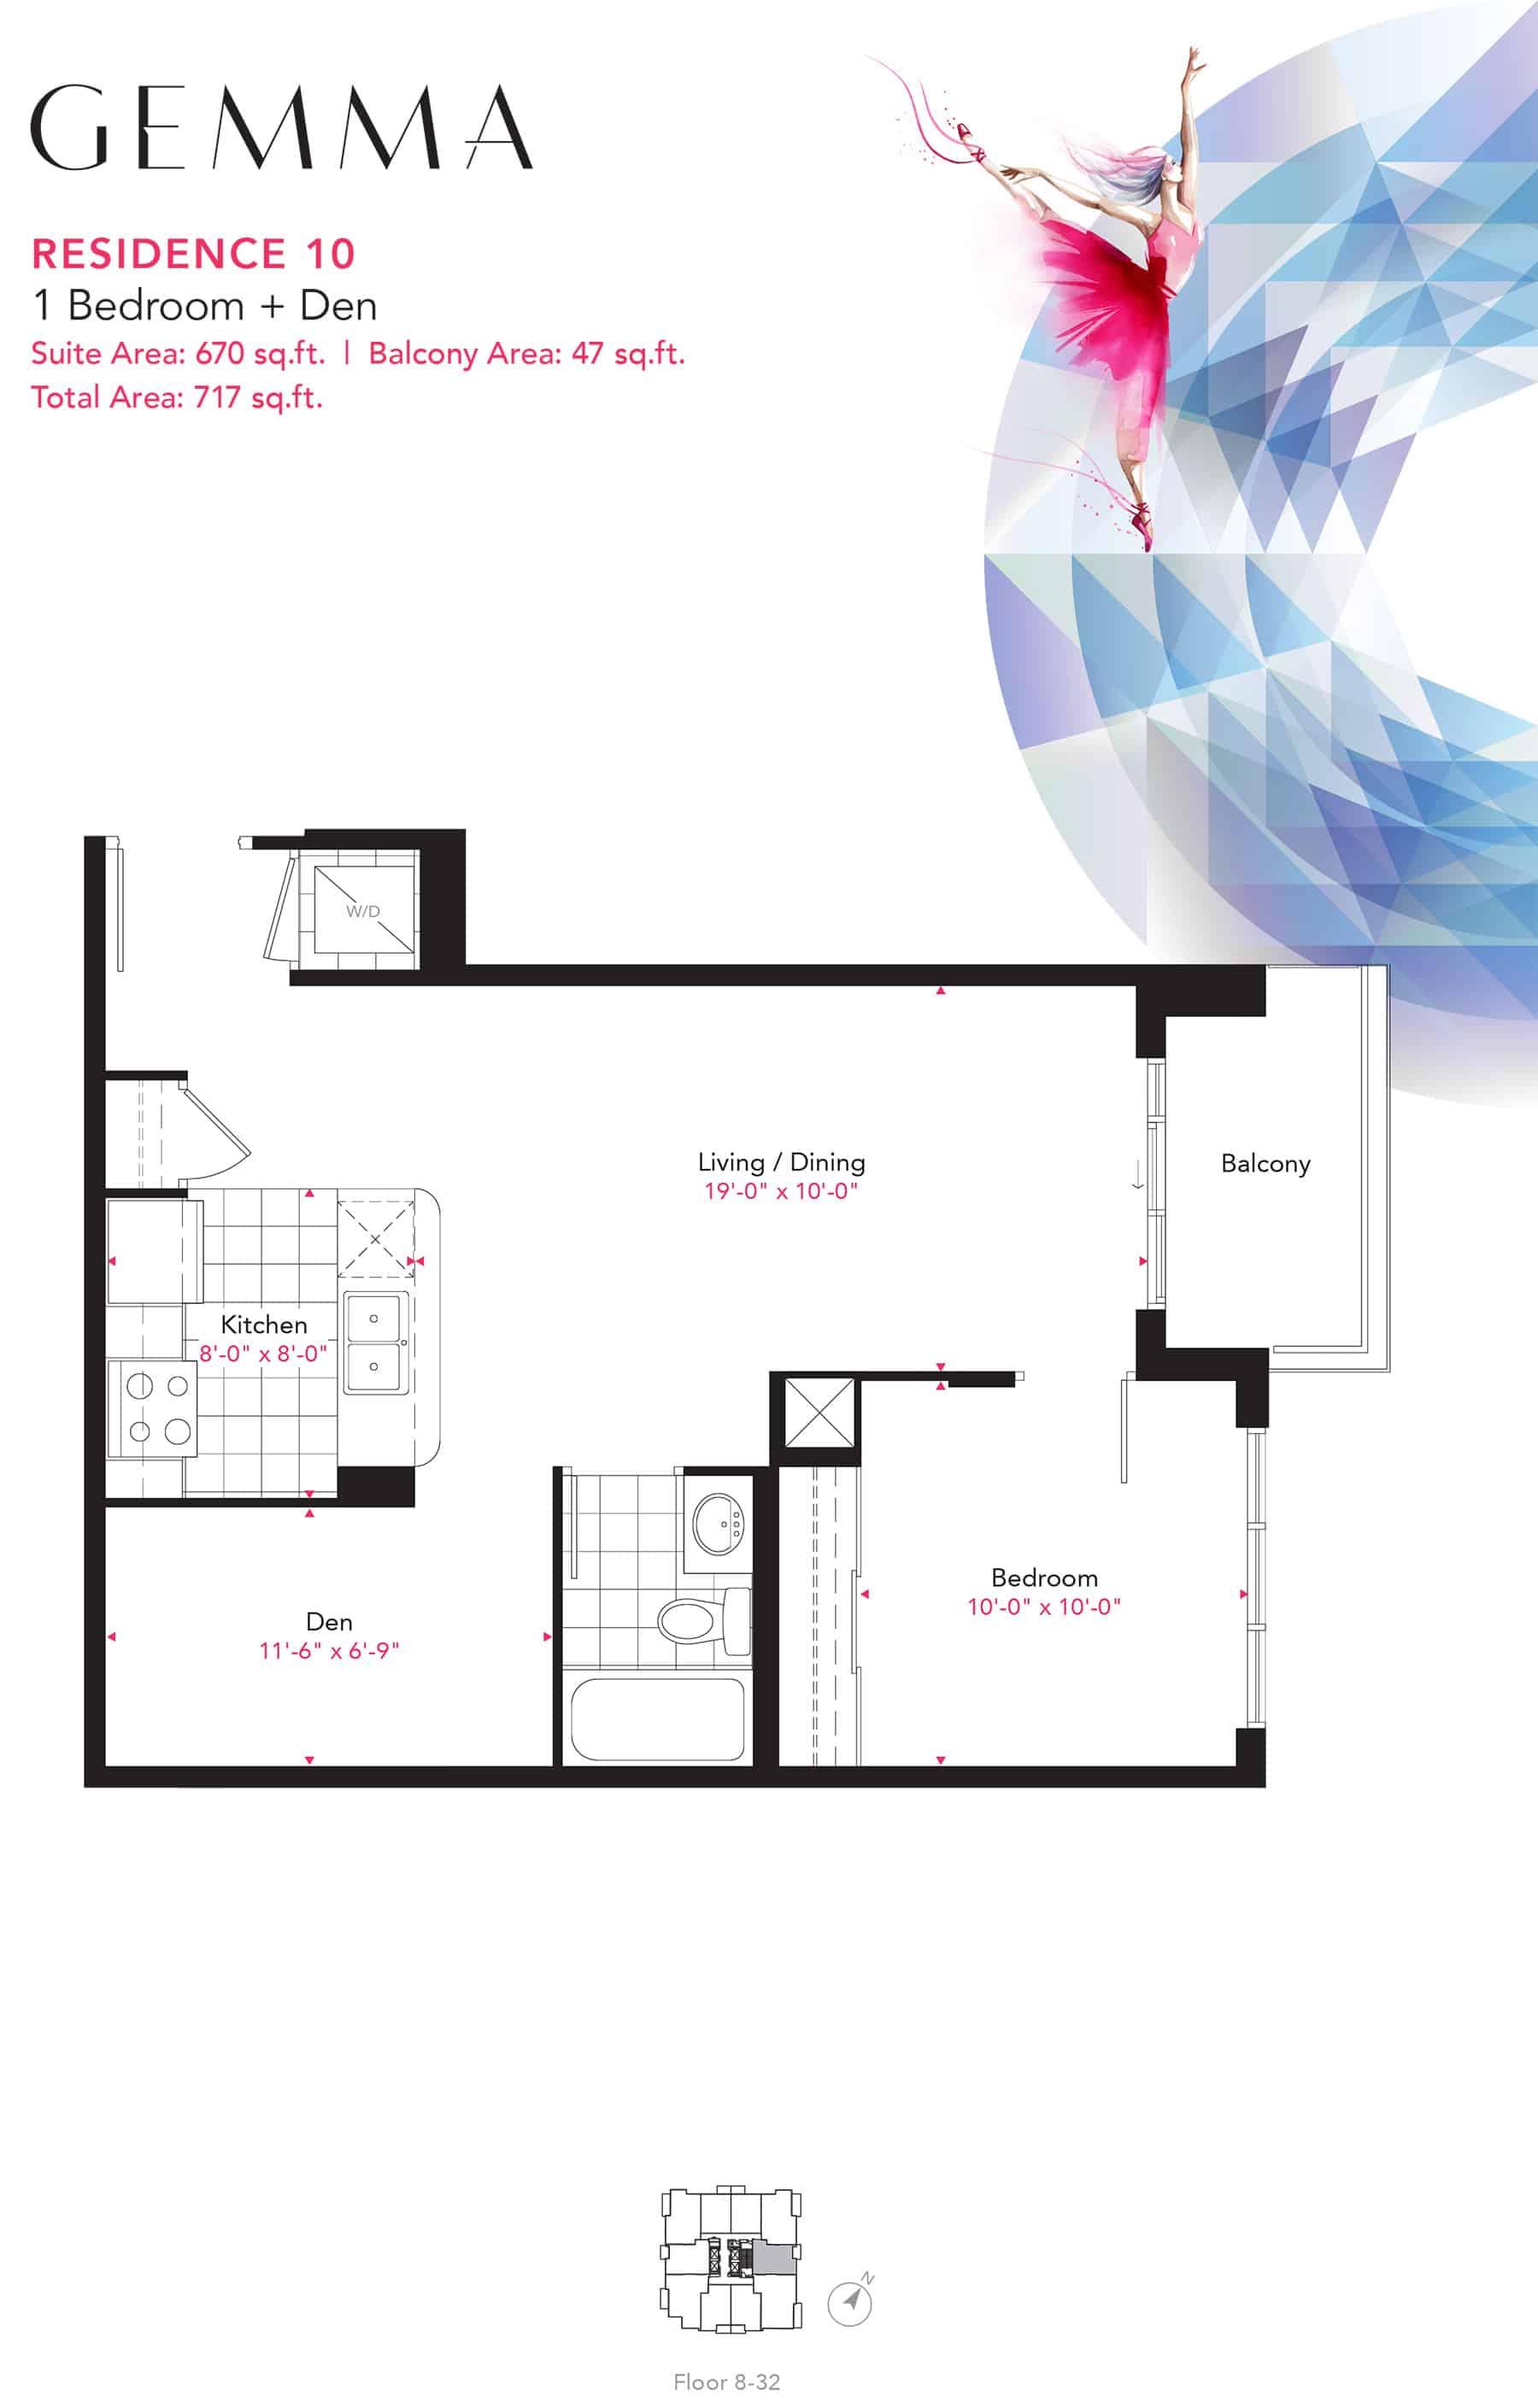 Residence-10-1B+D-670-Sqft-Gemma  Gemma Condos Residence 10 1BD 670 Sqft Gemma